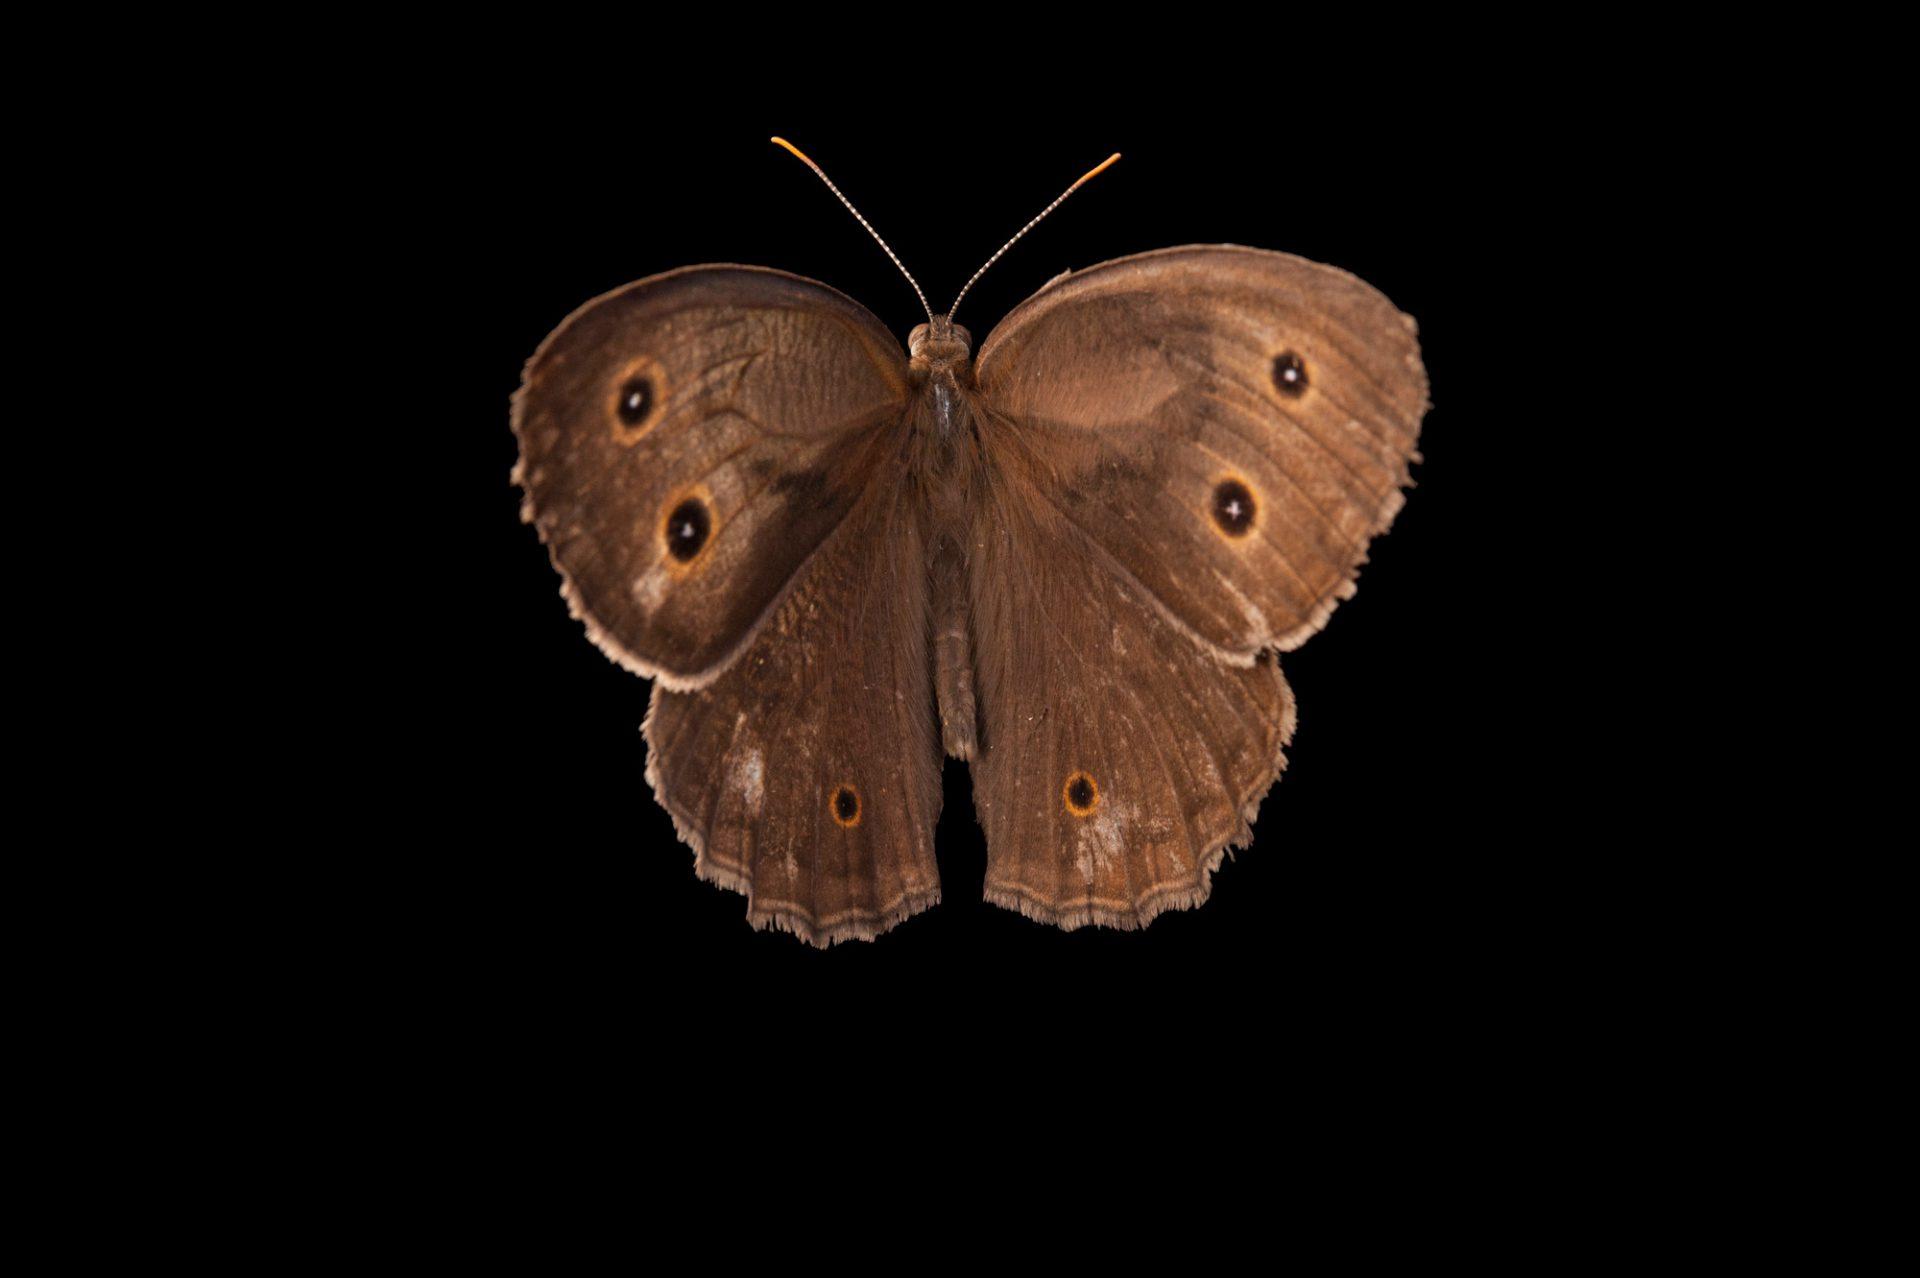 A common wood-nymph (Cercyonis pegala) from Dieken Prairie near Undadilla, Nebraska.